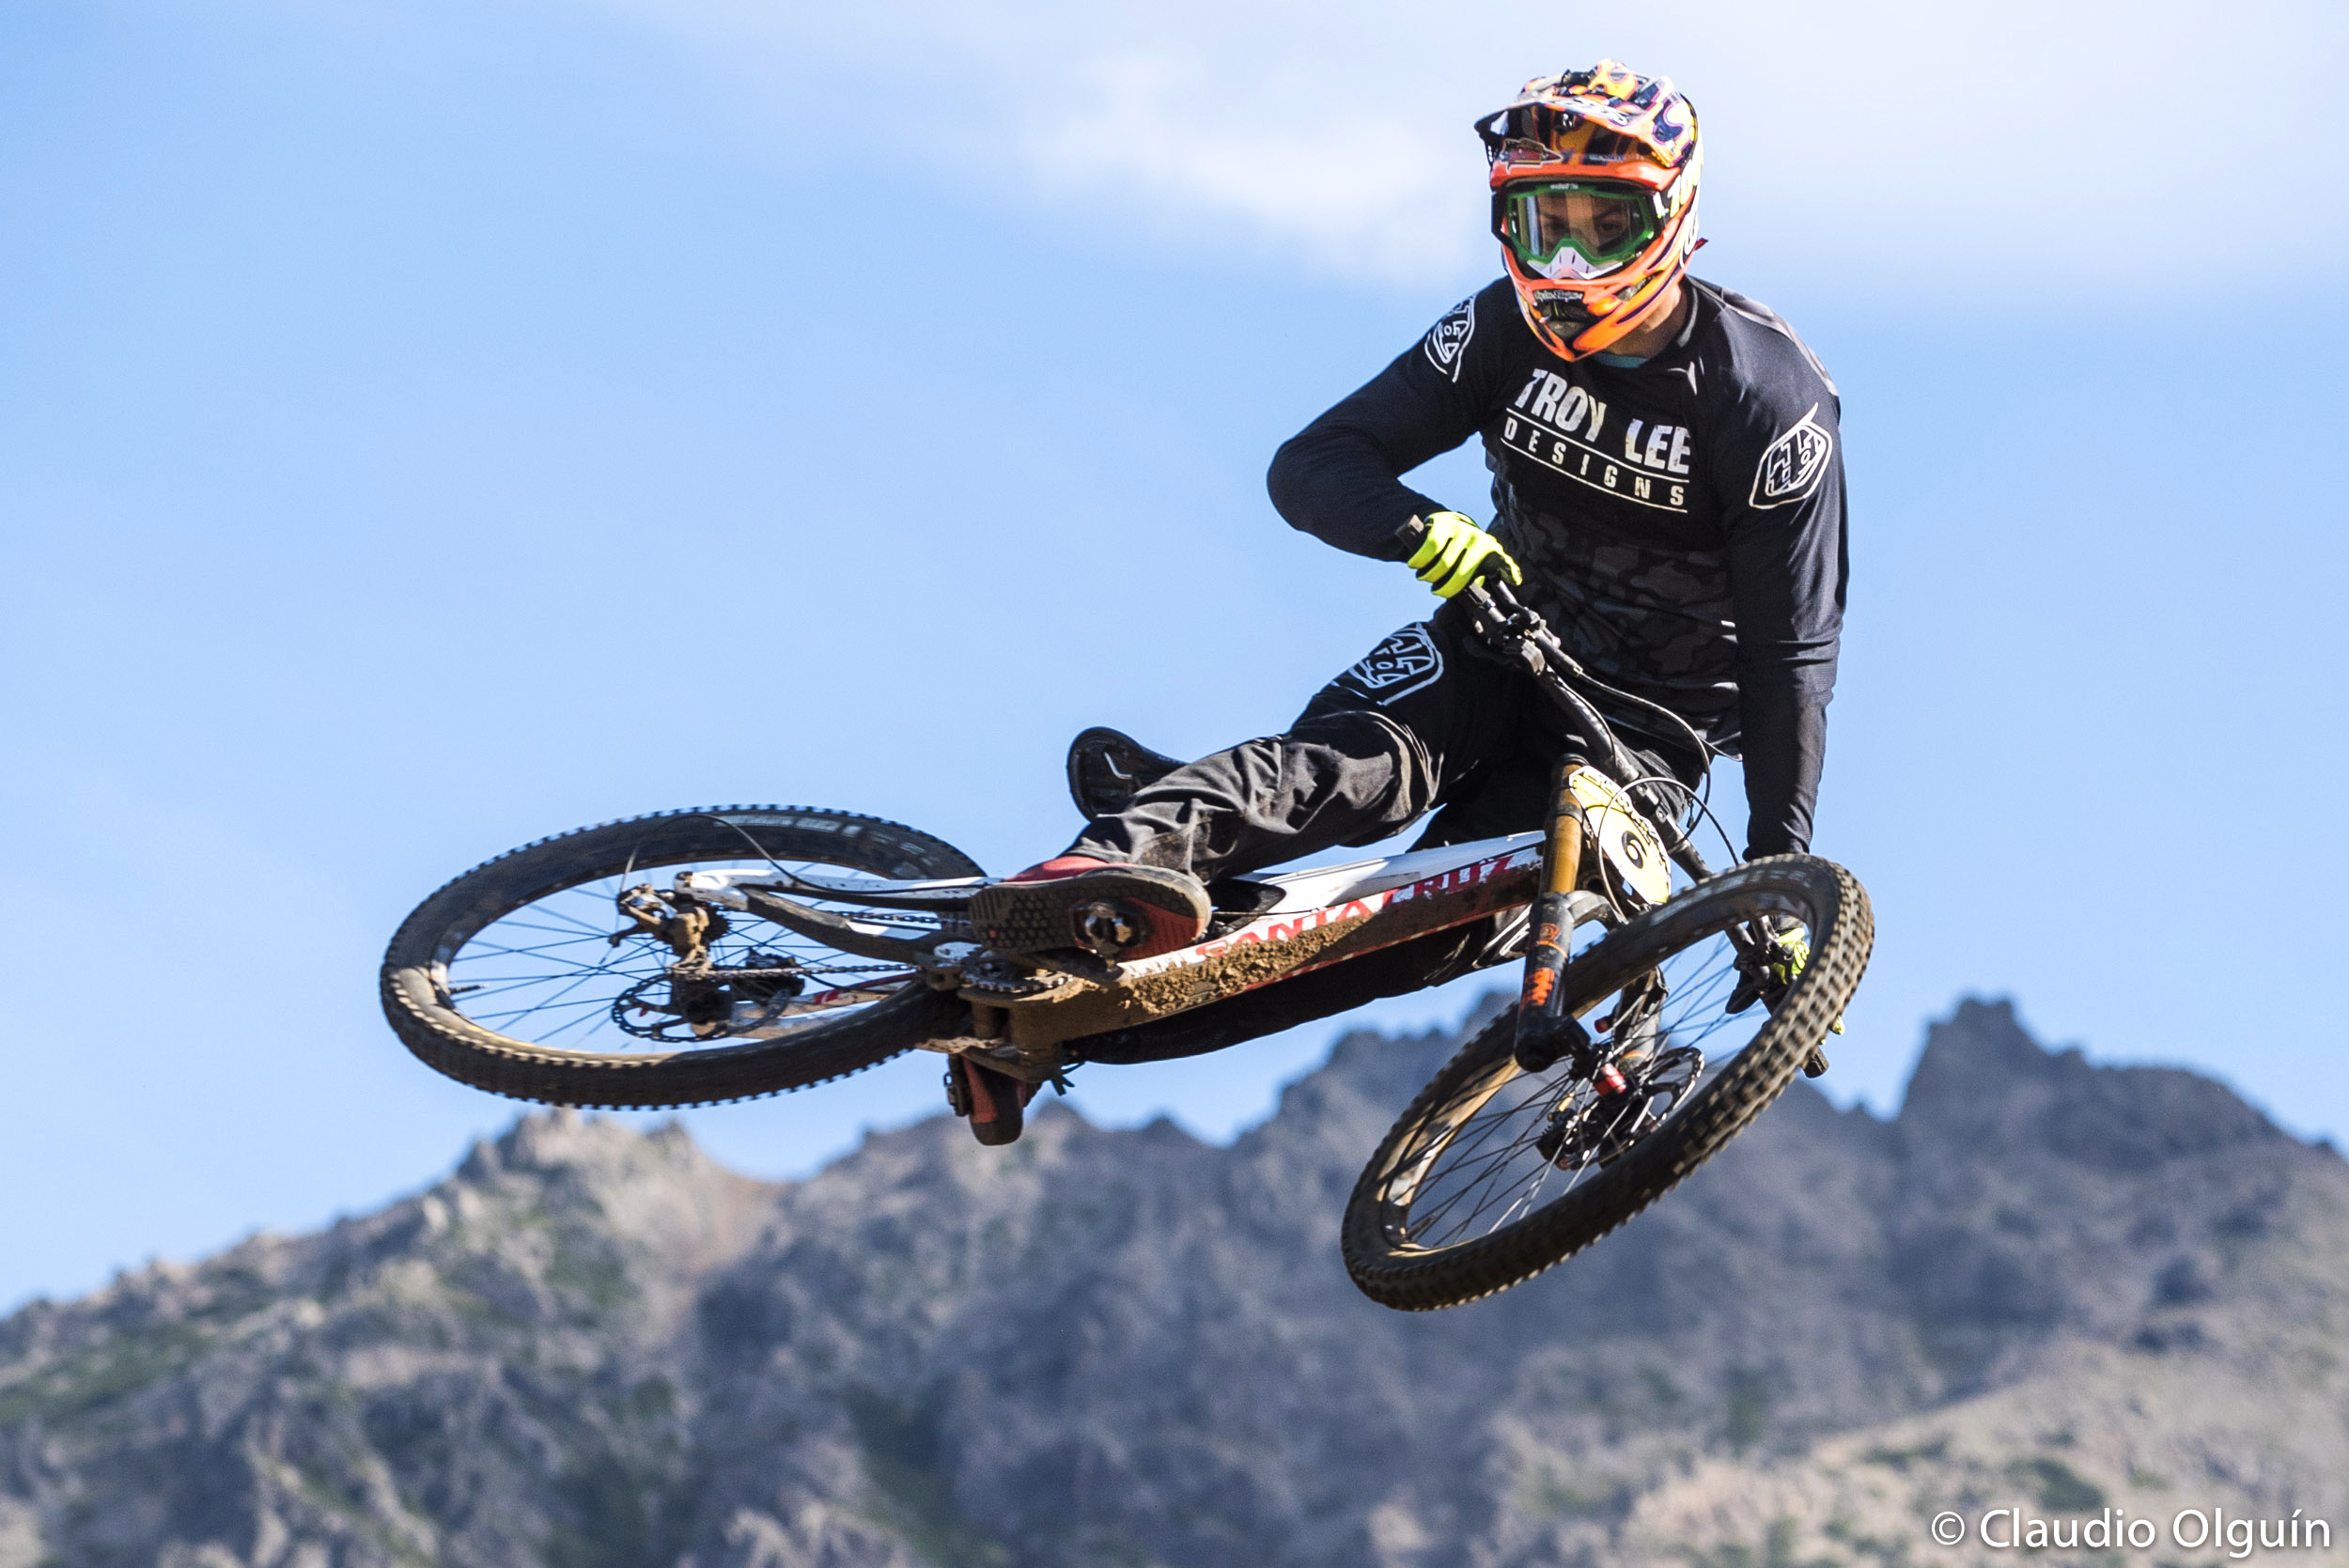 La cuarta fecha de IXSDownhill Cup Latinoamérica llega a Bariloche